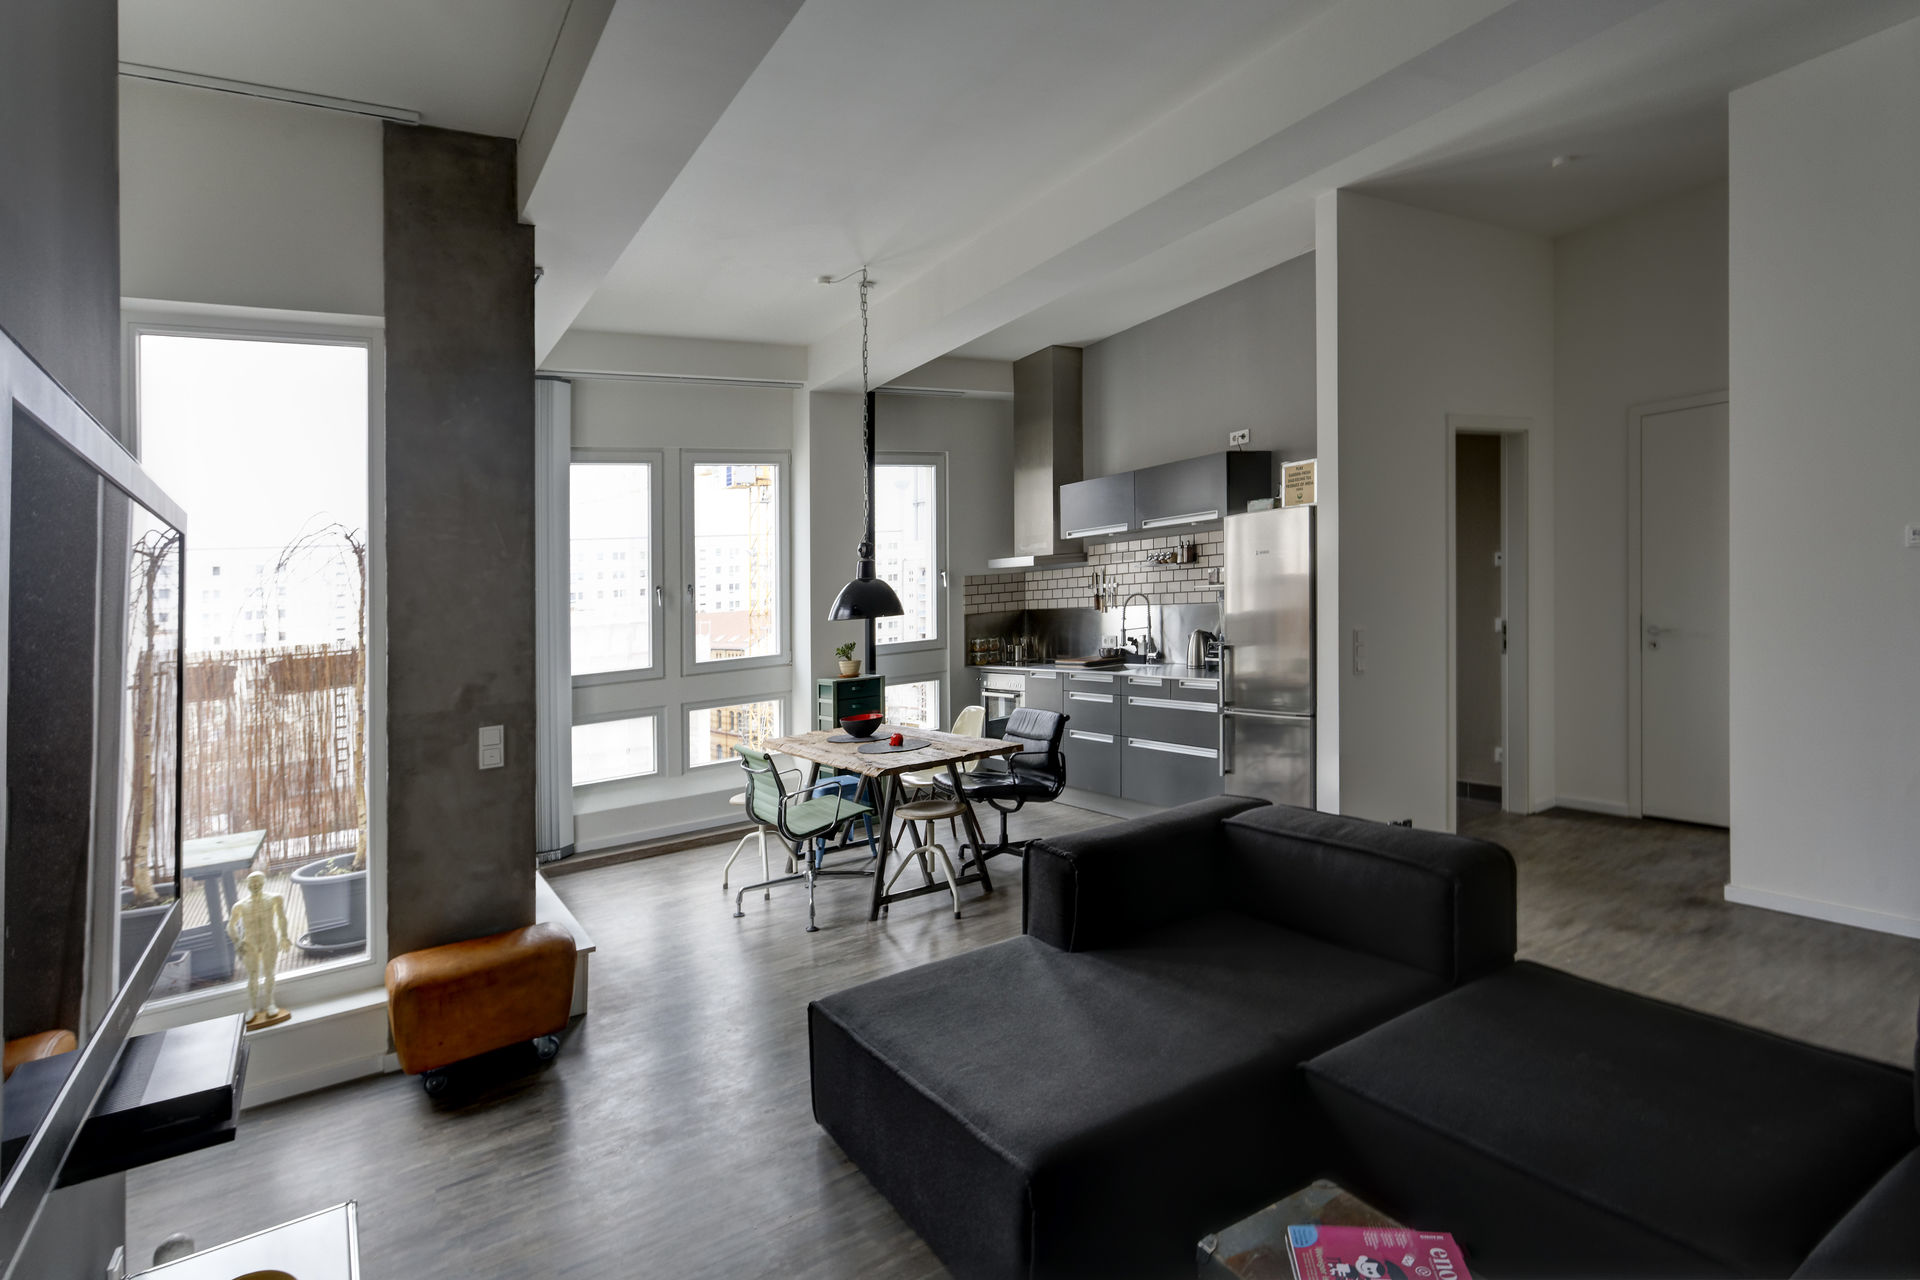 saniertes loft in alter fabrik mit terrasse farawayhome. Black Bedroom Furniture Sets. Home Design Ideas